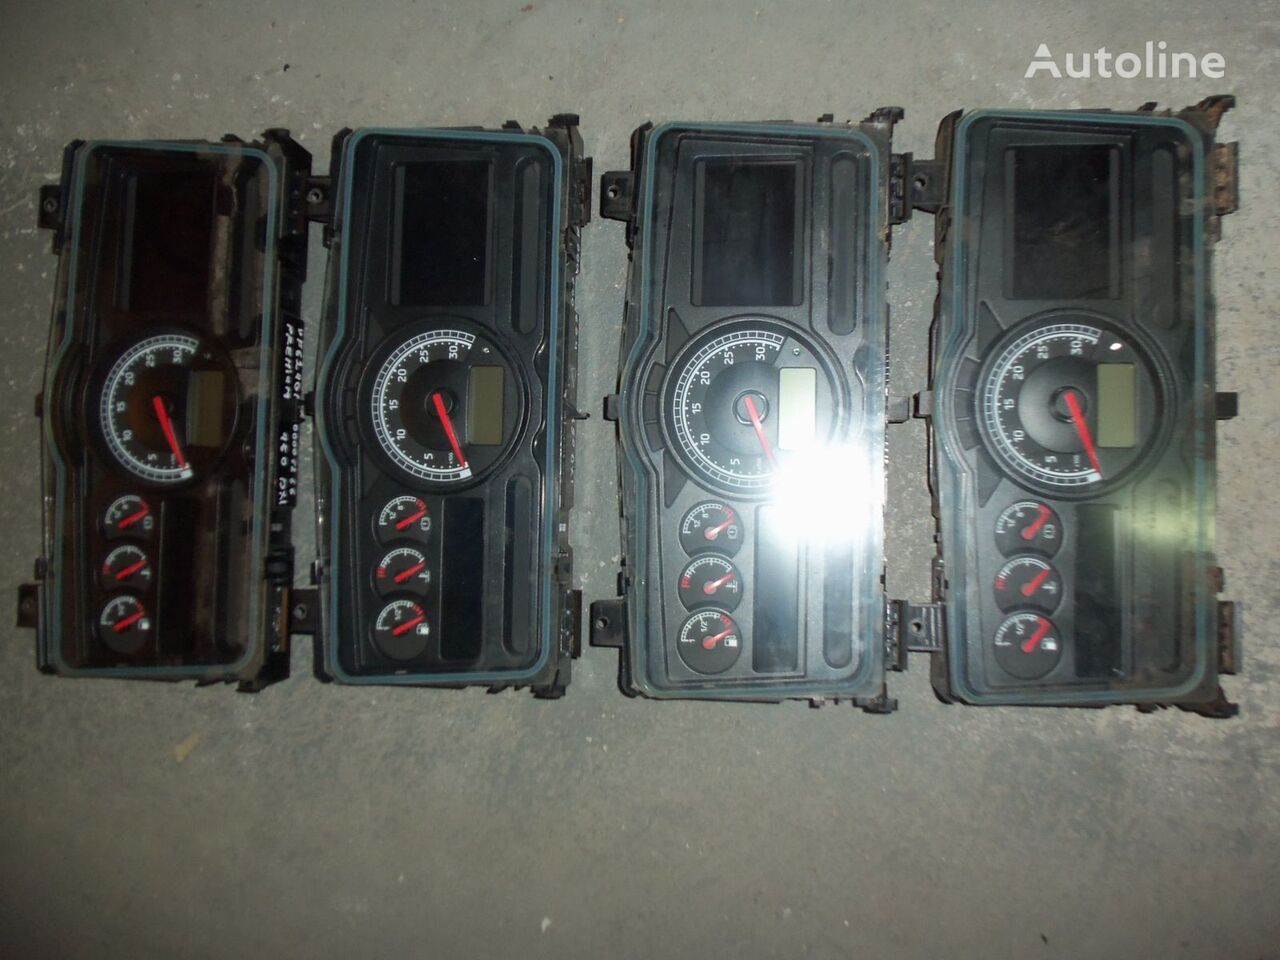 RENAULT instrument panel, dashboard, 7420771818 panou cu dispozitive pentru RENAULT Premium DXI autotractor